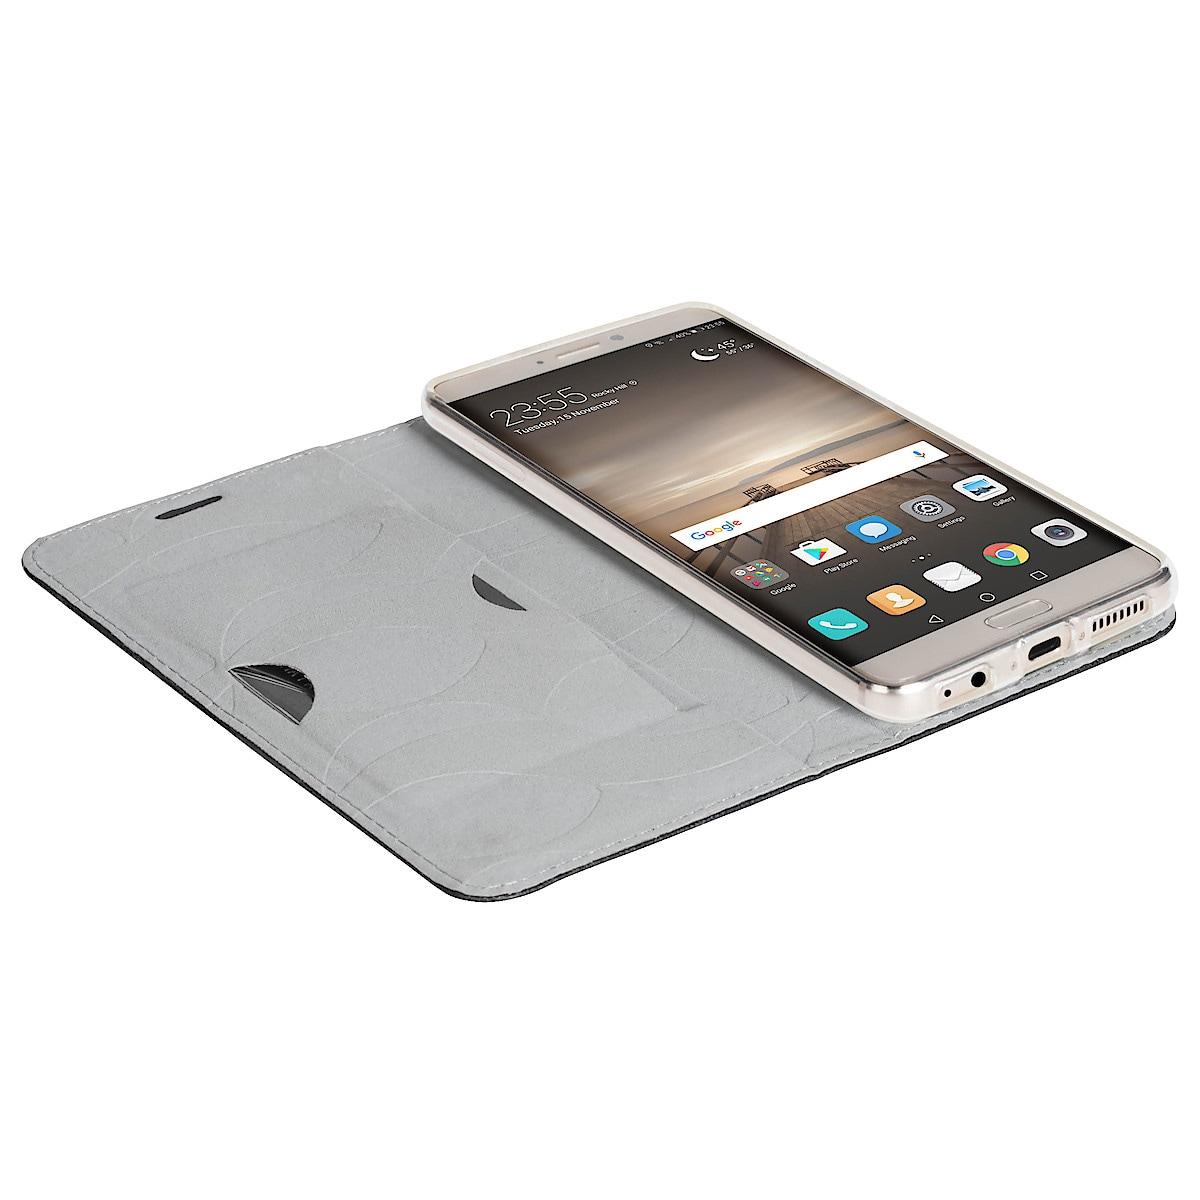 Taschenportemonnaie för Huawei Mate 9 Pro, Krusell Malmö FolioCase